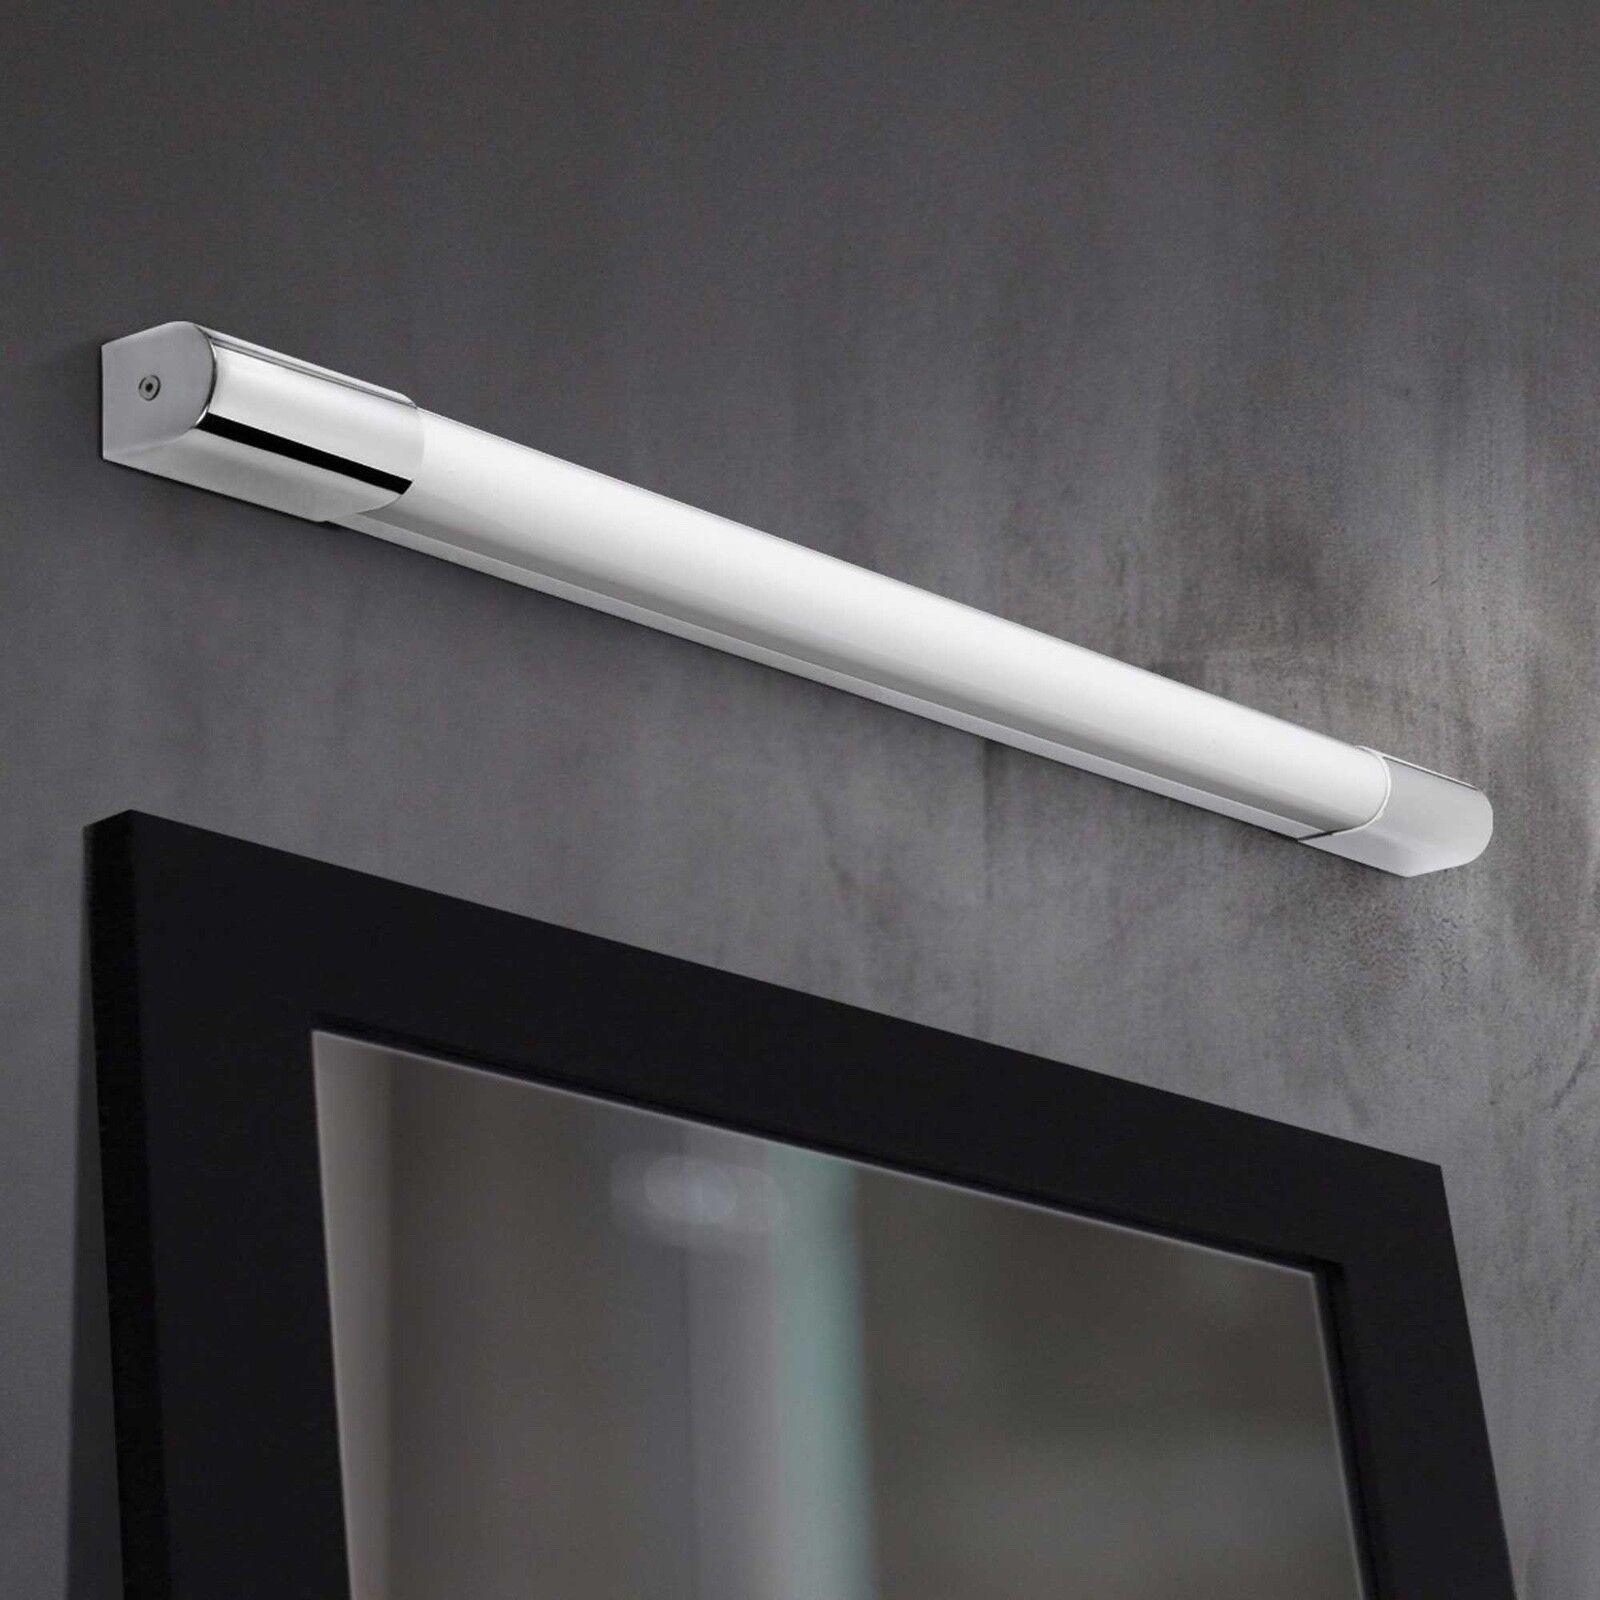 Wofi LED-Wandleuchte Clayton 1-flg Chrom Bad Röhrenleuchte 9 Watt 640 Lumen